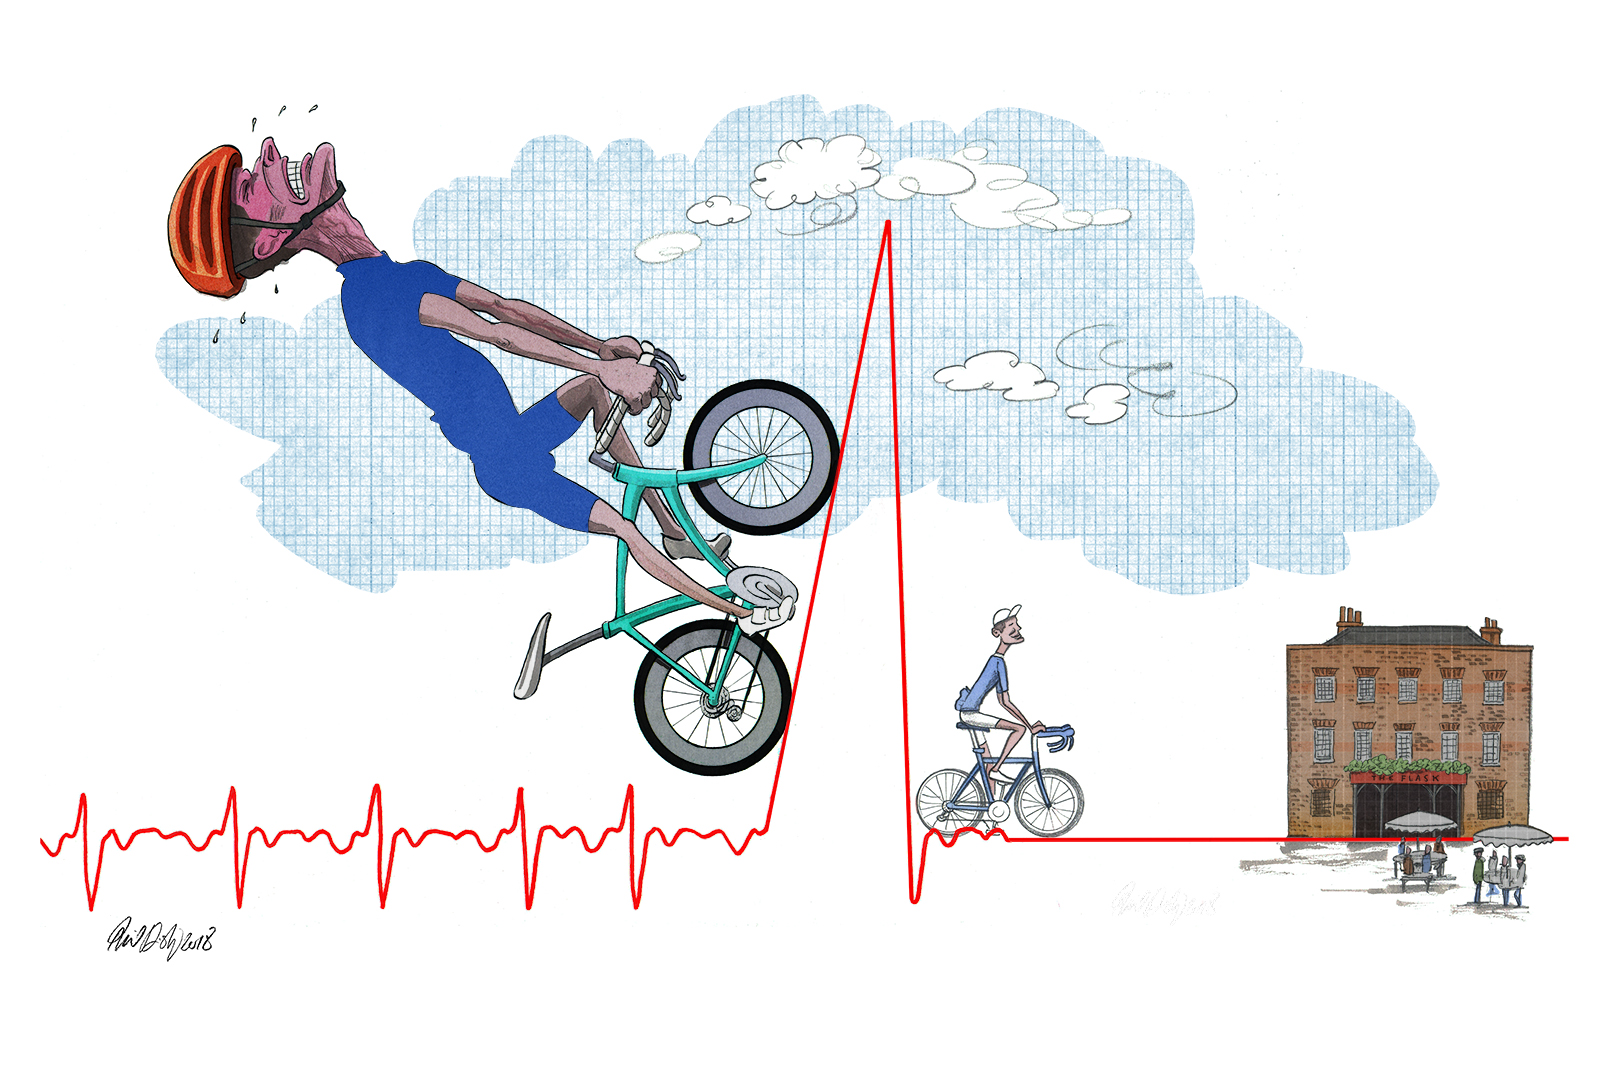 Phil Disley / Alpha Cyclist / Financial Times